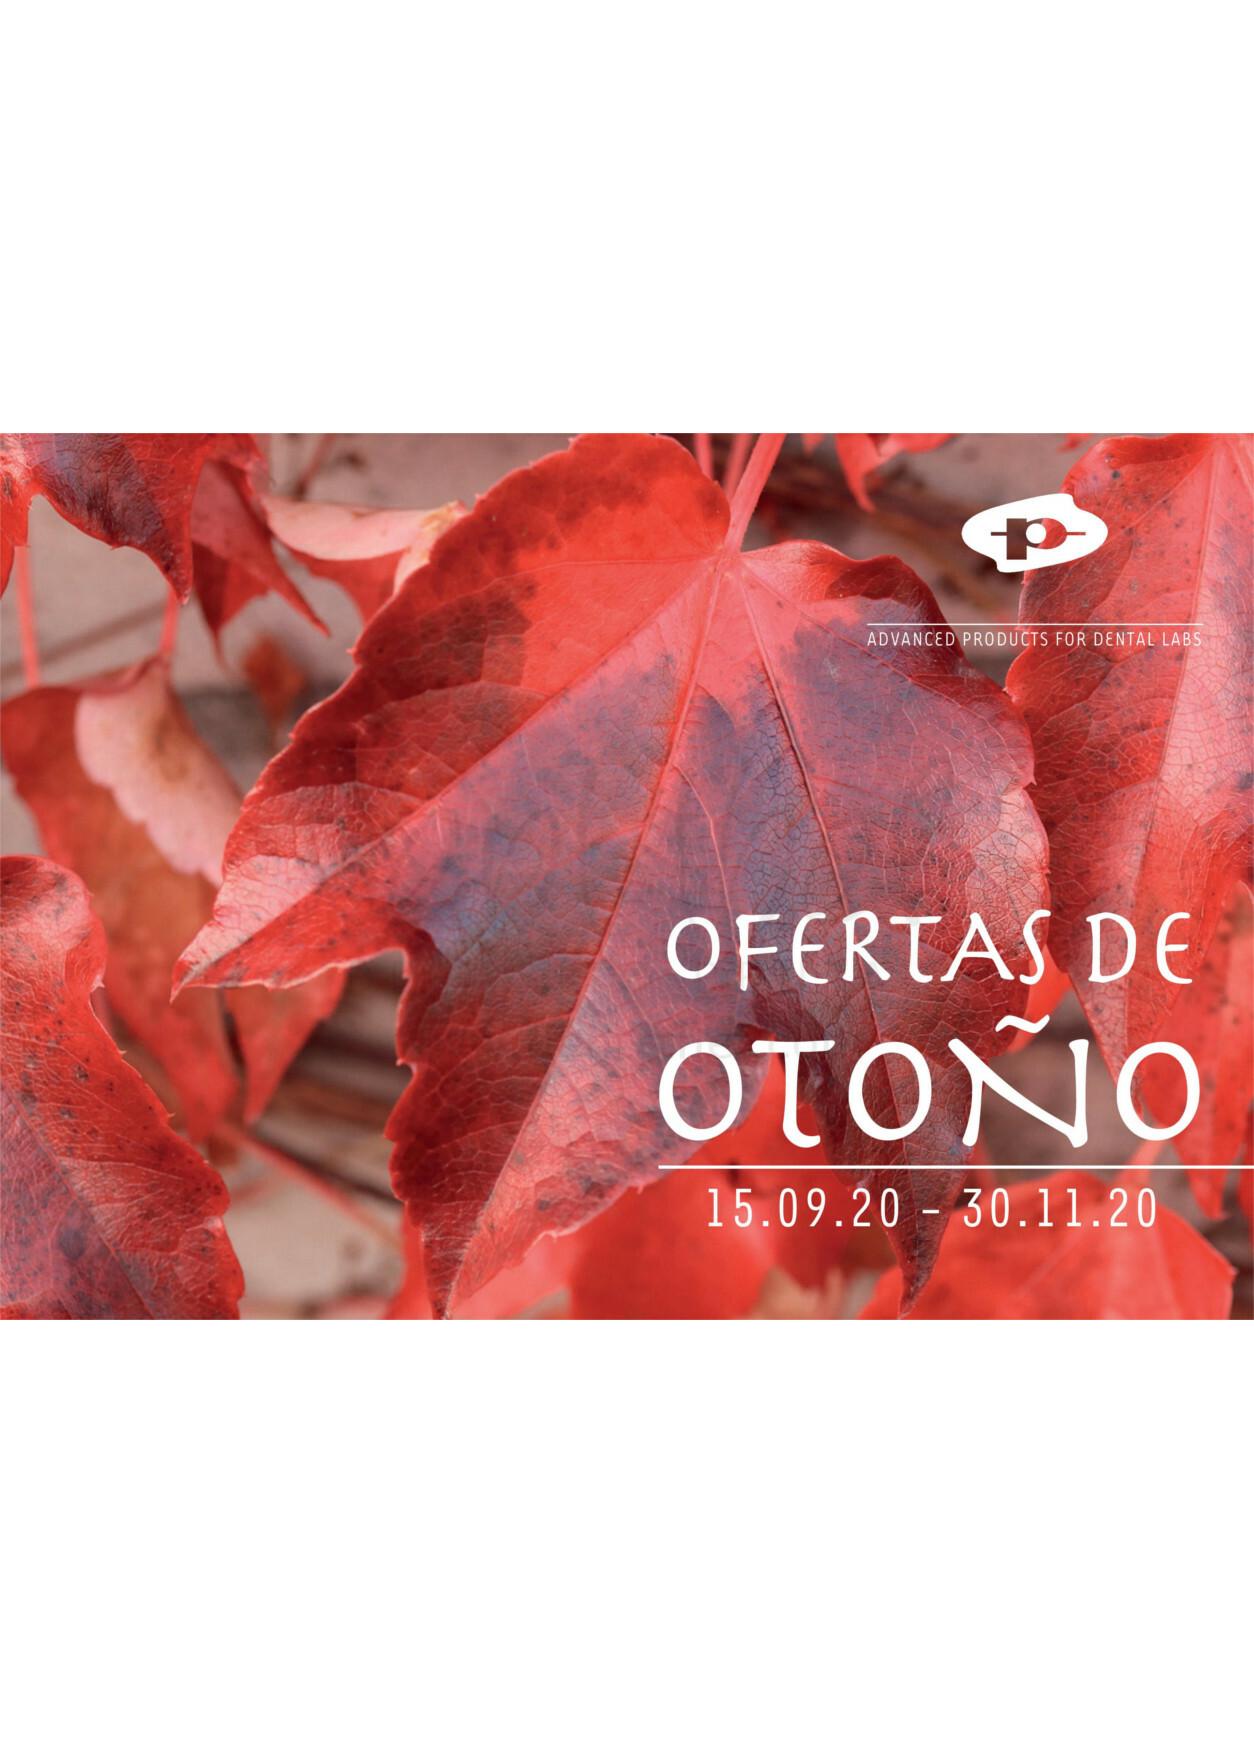 Ofertas Protechno hasta 30/11/2020